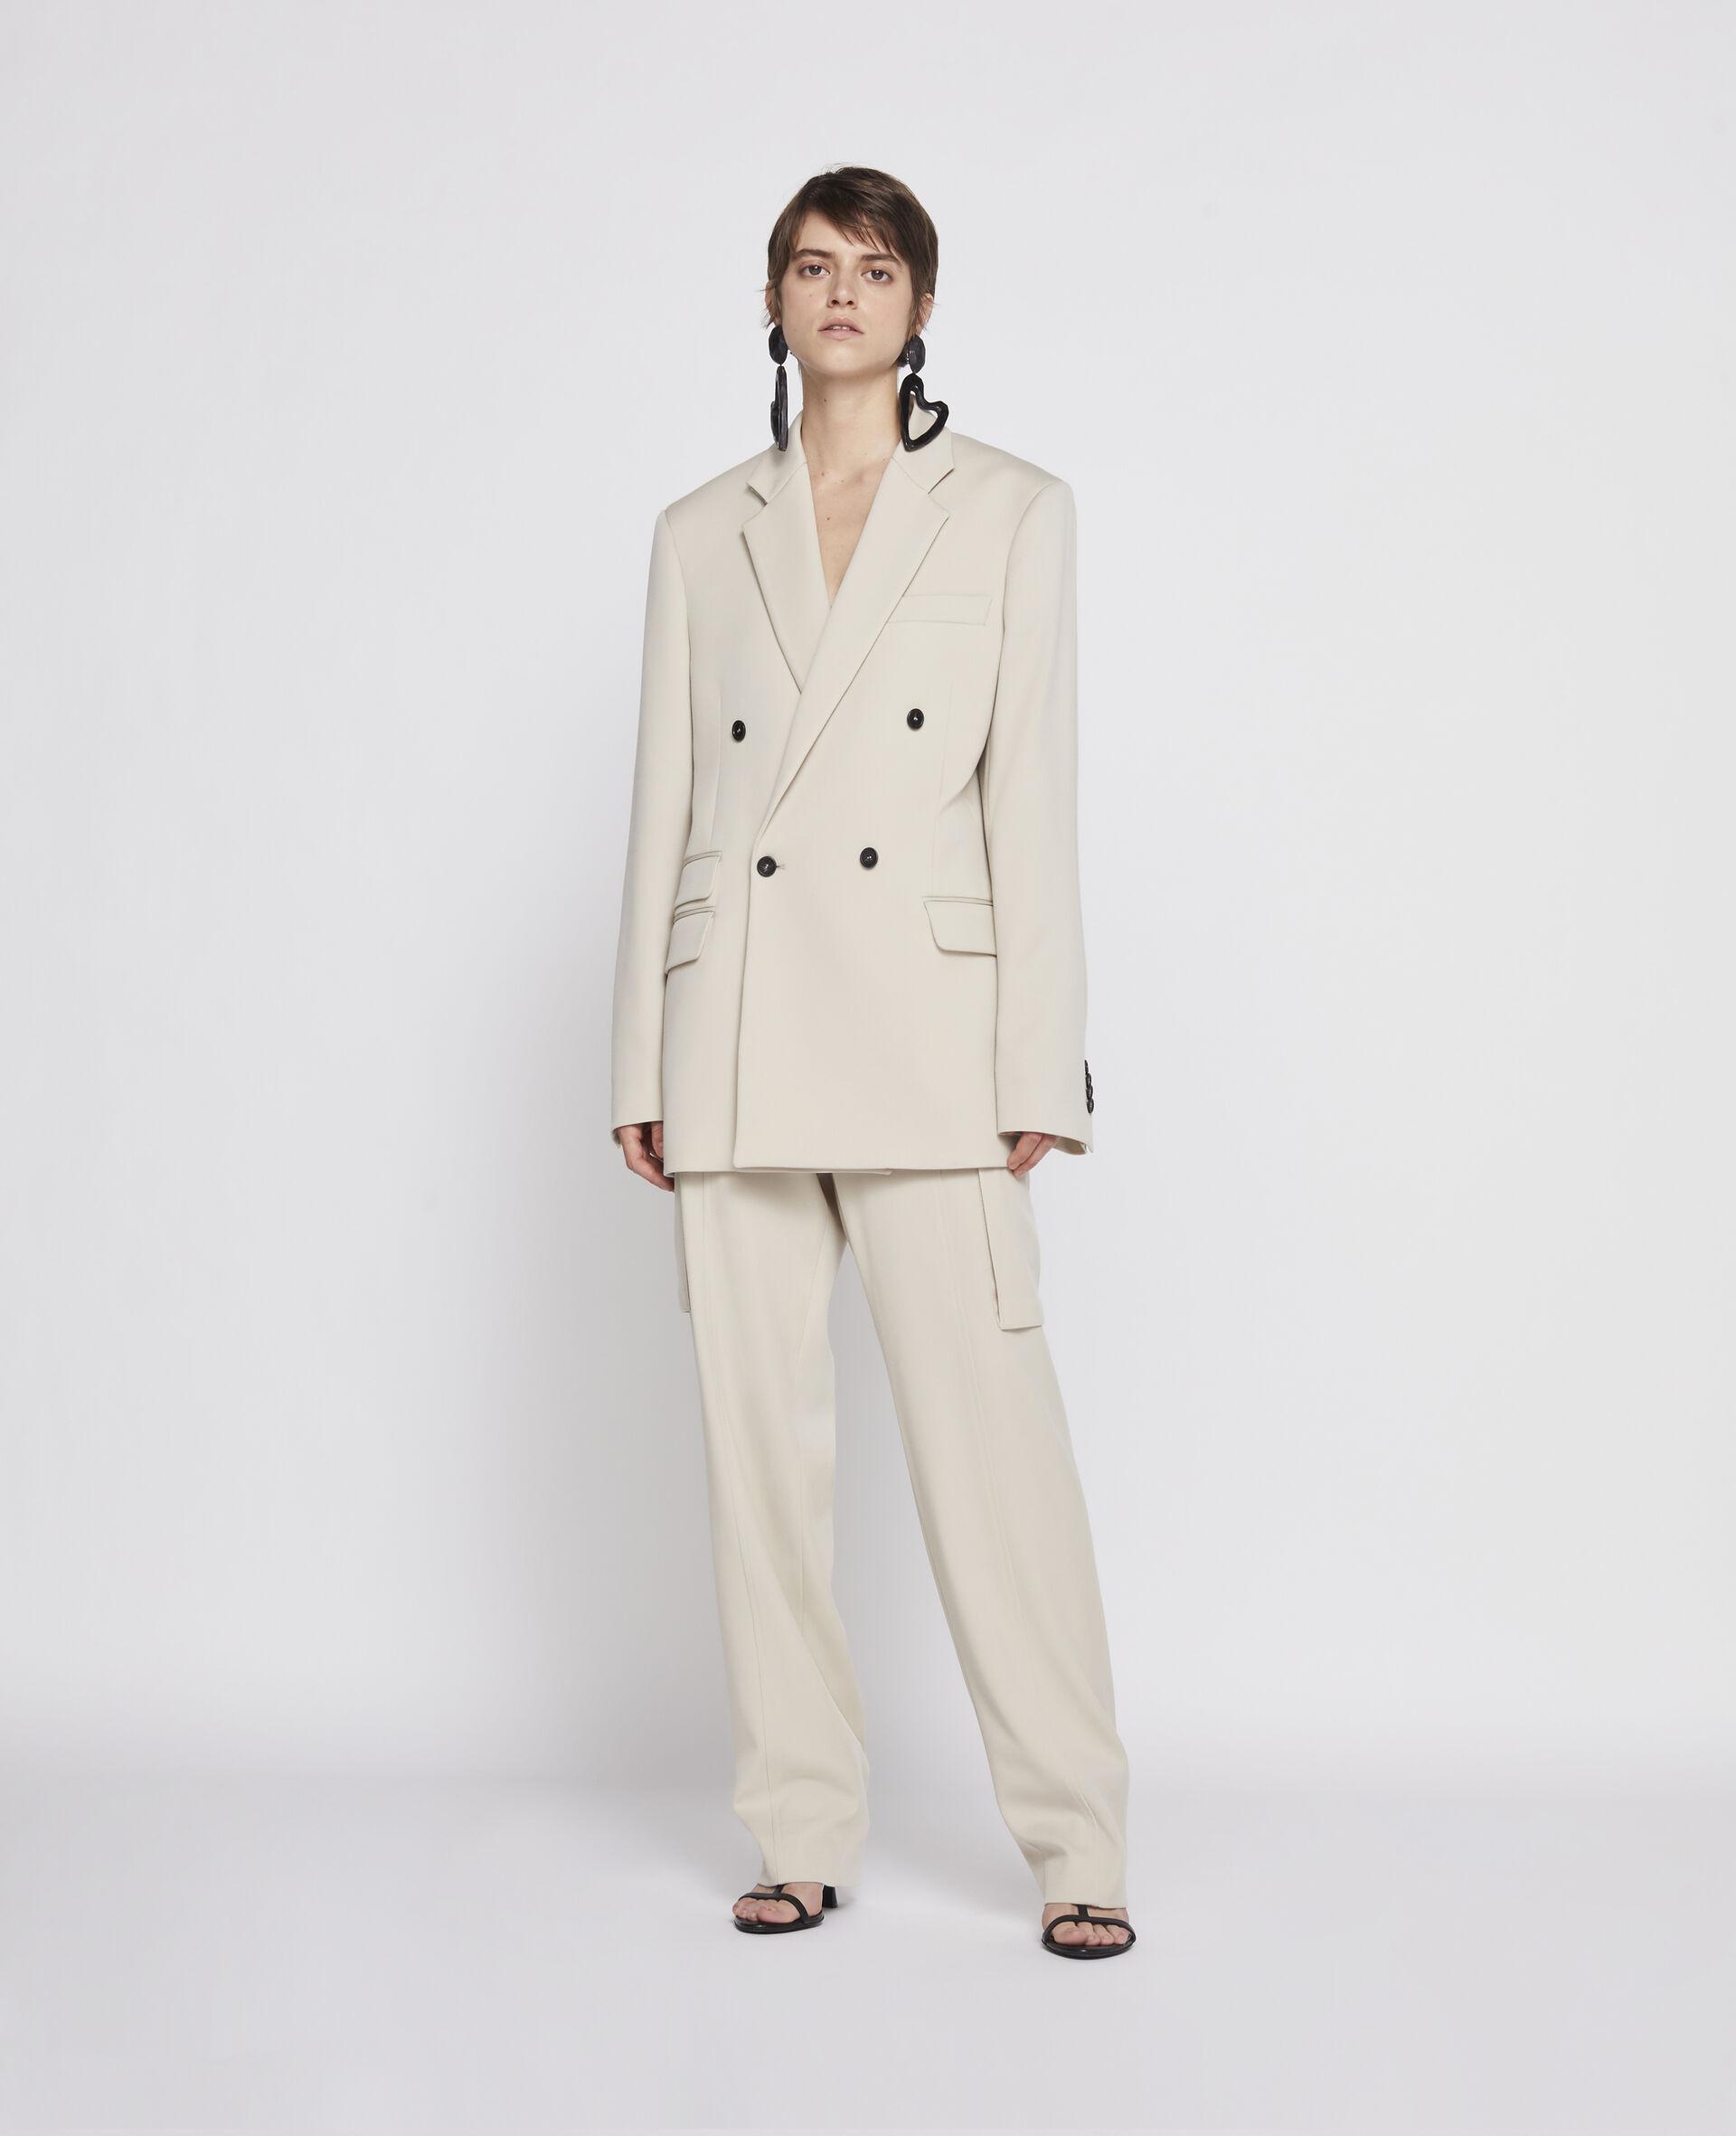 Pantaloni Sabbia Chiaro-Beige-large image number 3